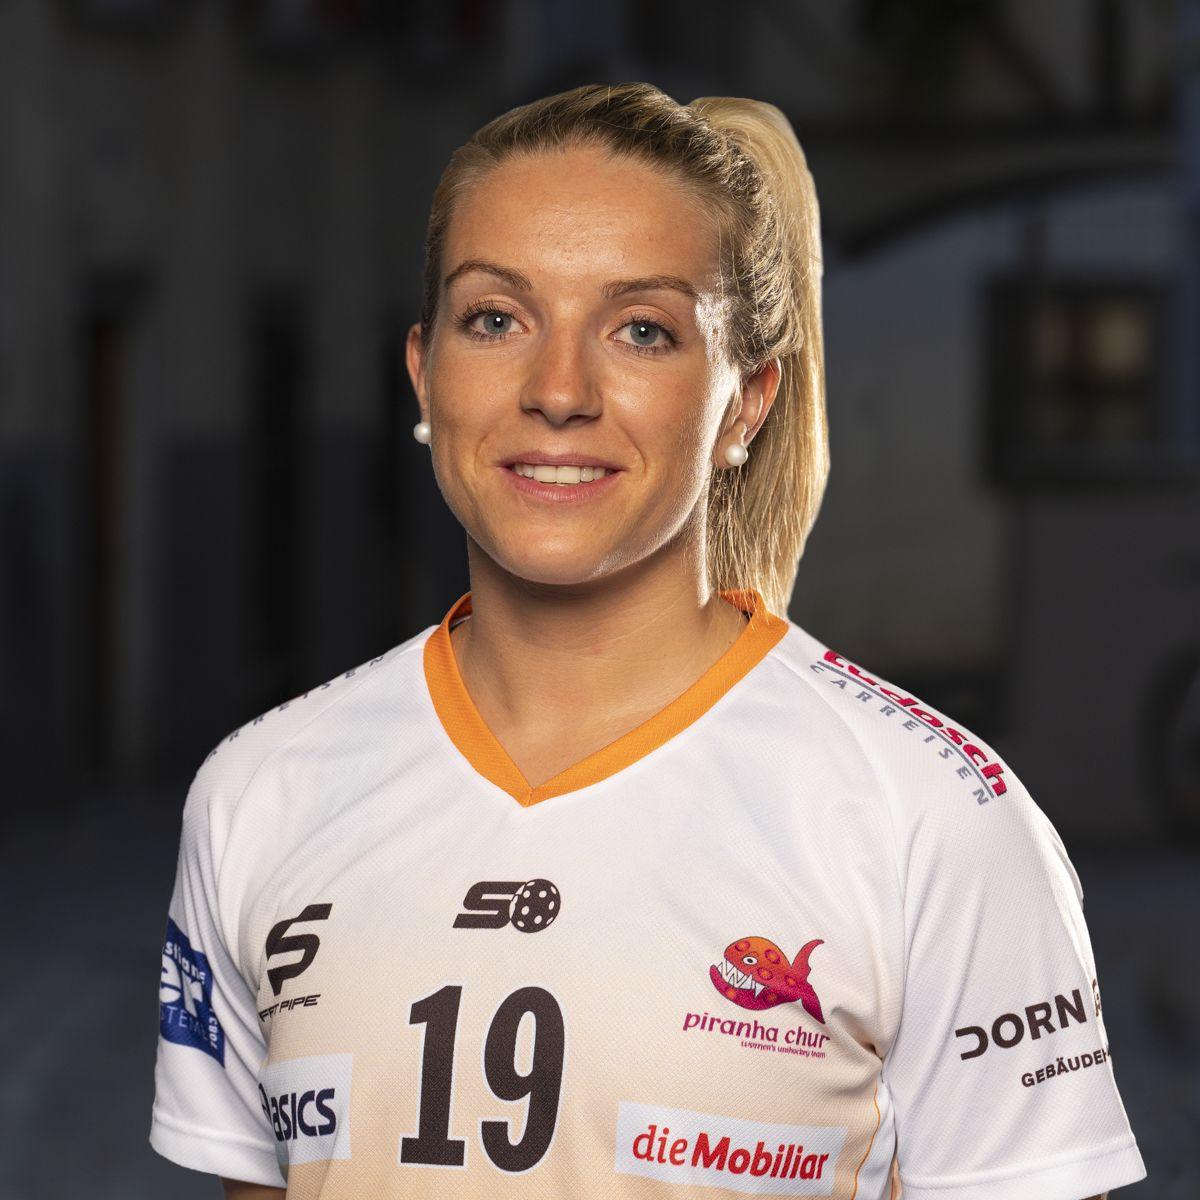 Anja Dellagiovanna #19_NLA_piranha Chur_Saison 2019-2020_1200x1200_01.jpg